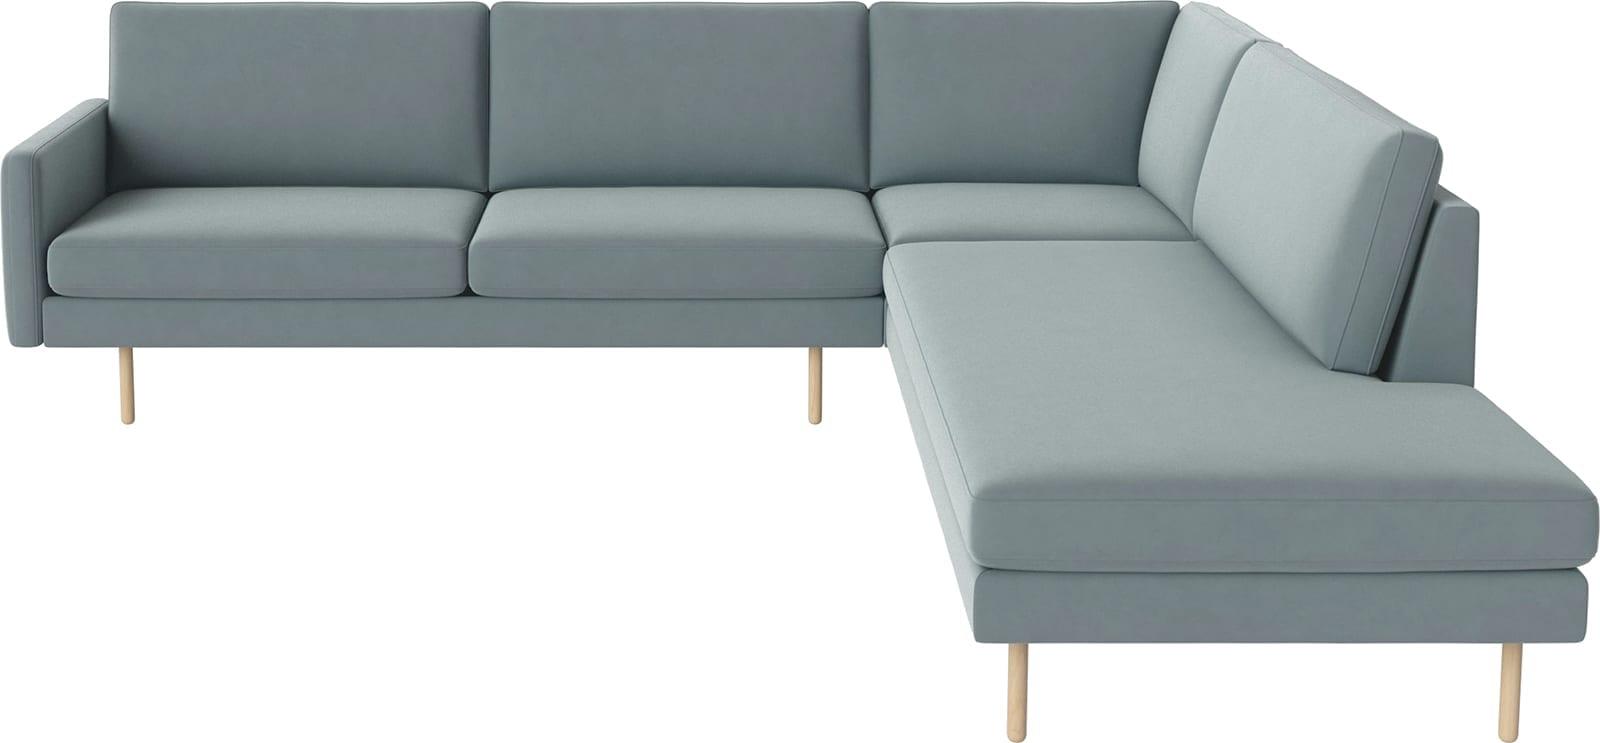 Scandinavia Remix 5 Seater Corner Sofa